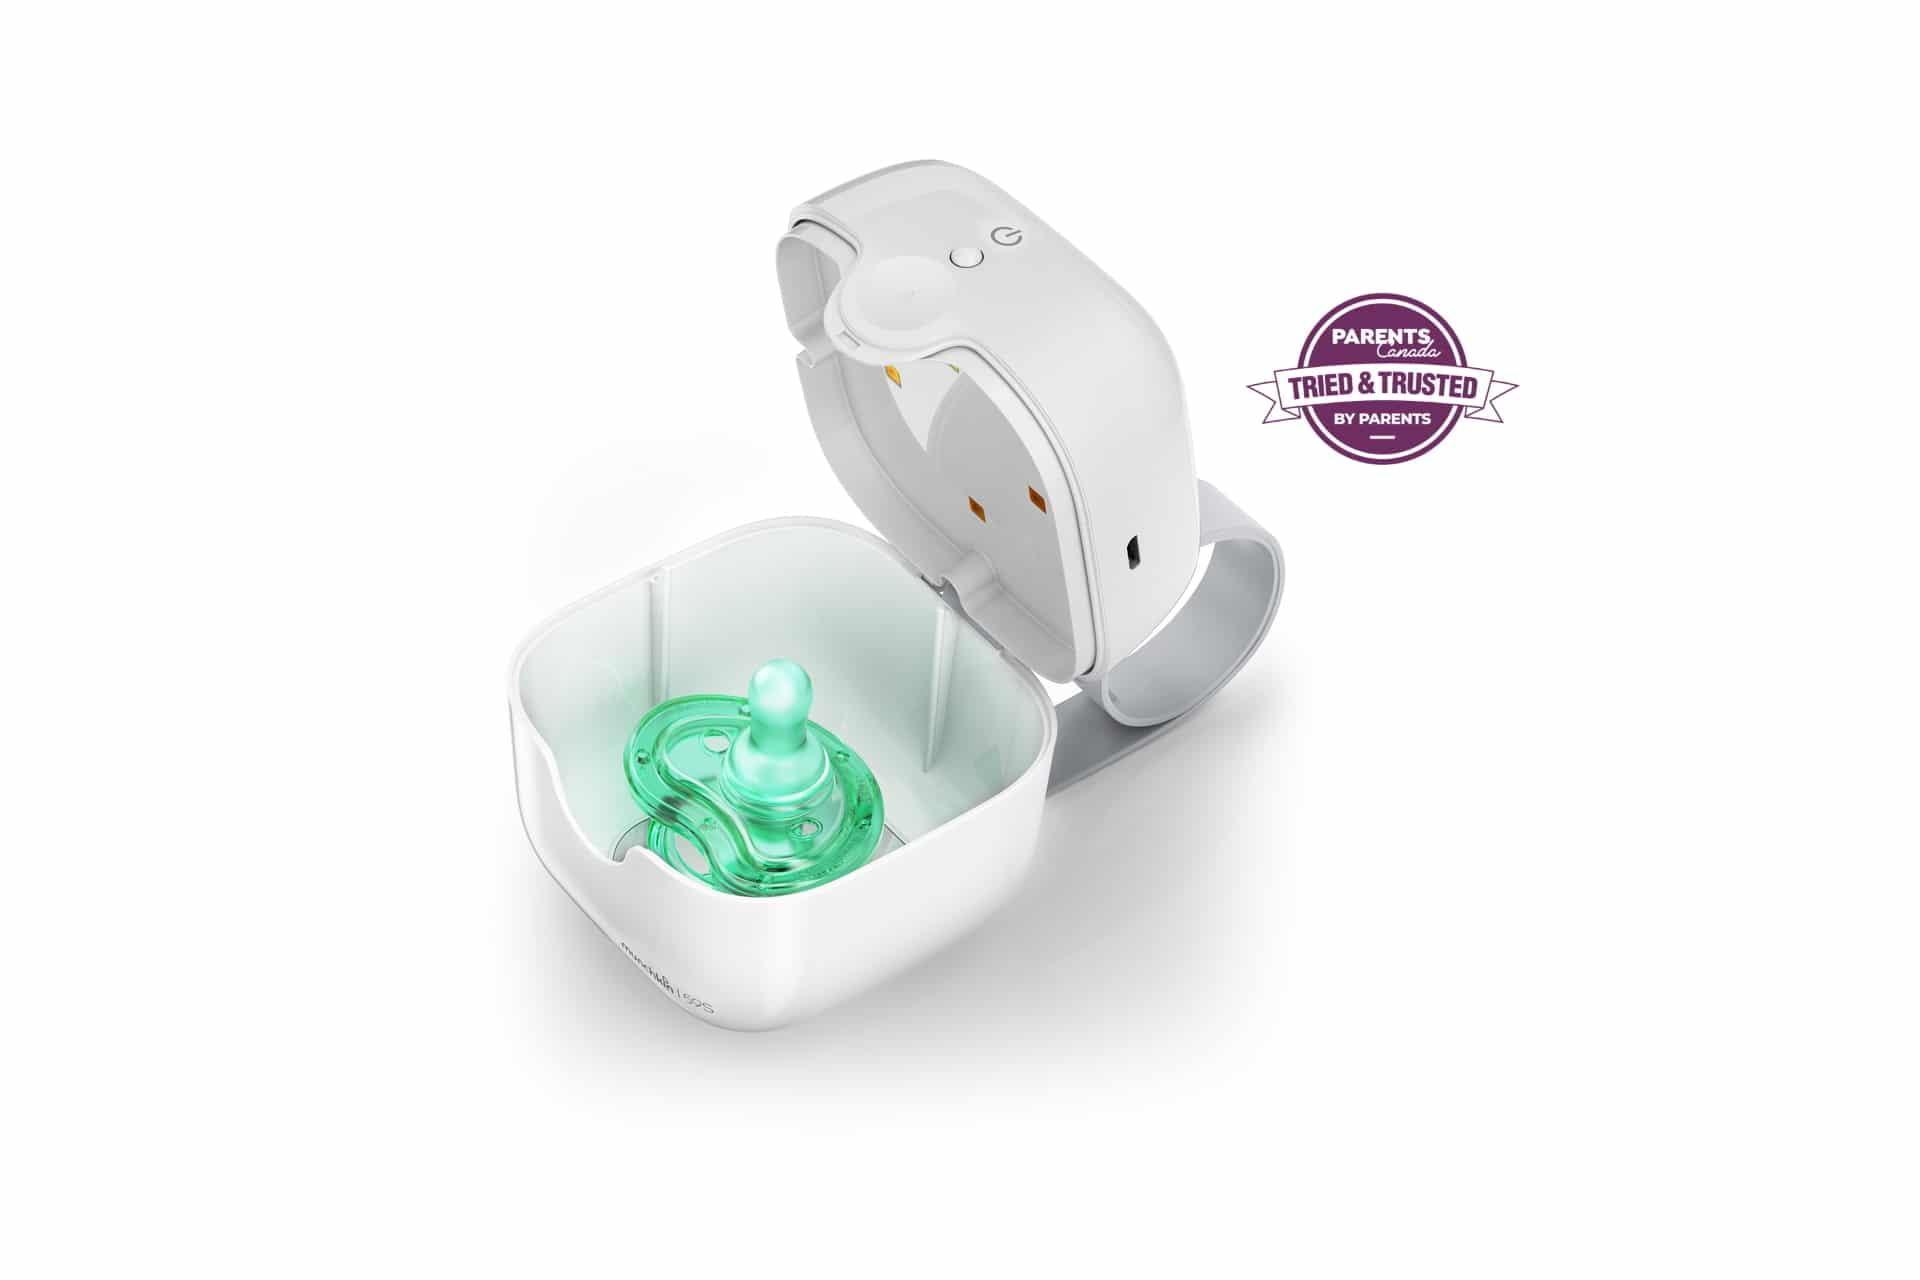 Munchkin Mini Sterilizer